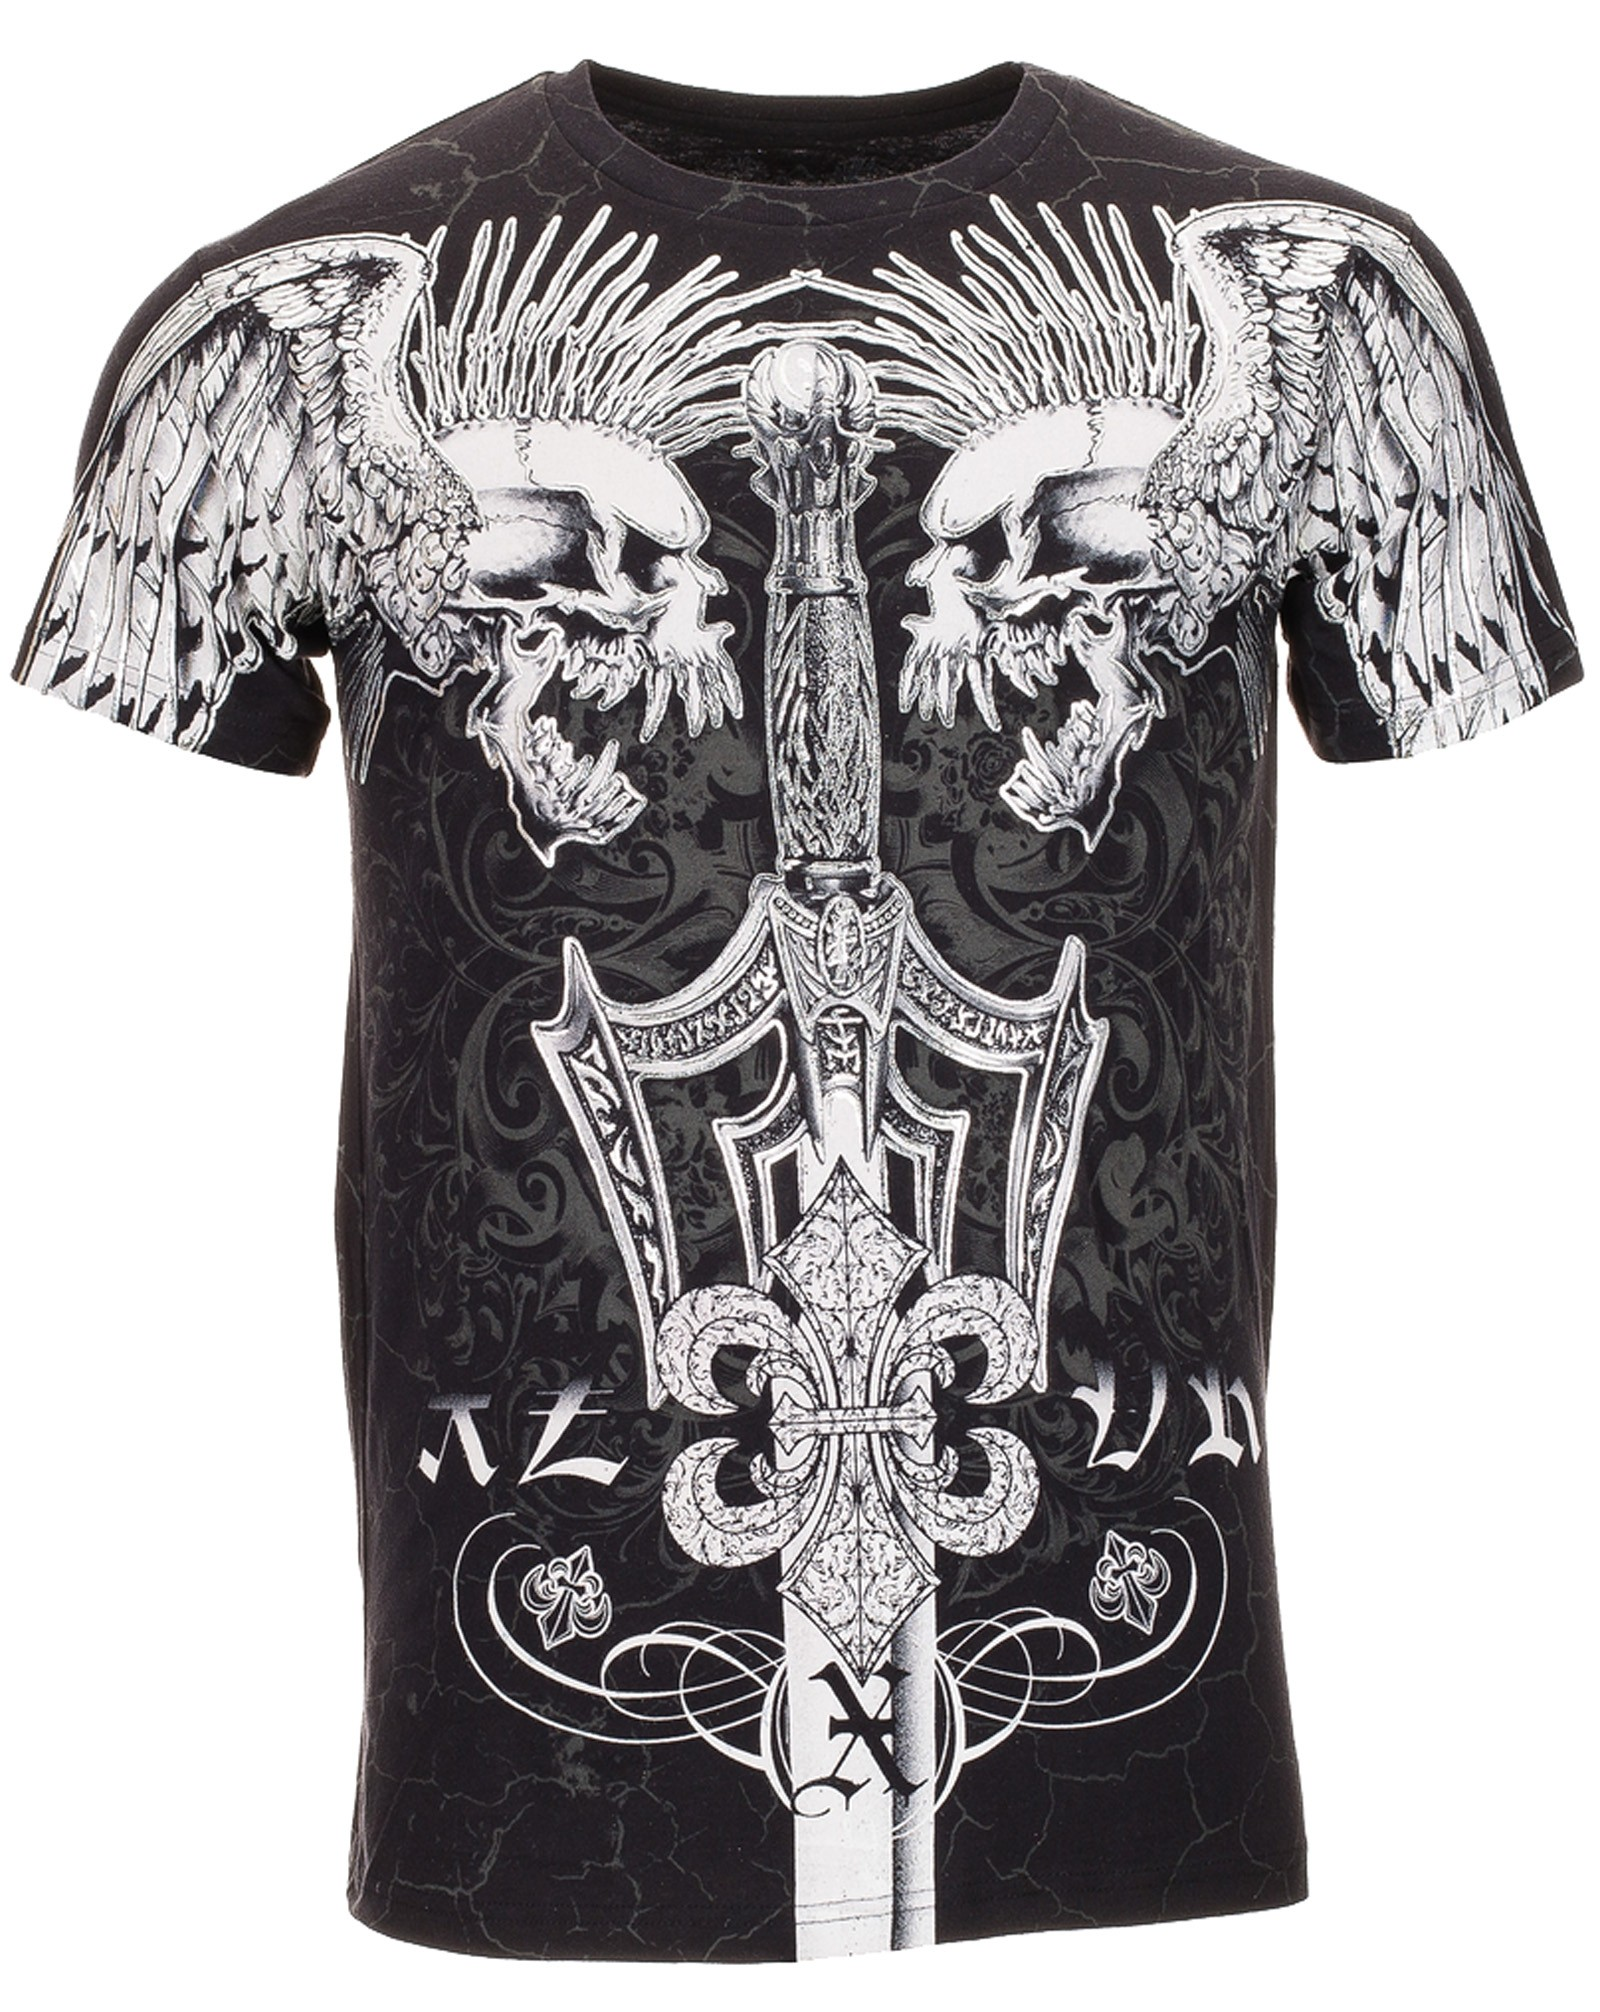 Xzavier - Screaming Punk Skulls T-Shirt Front